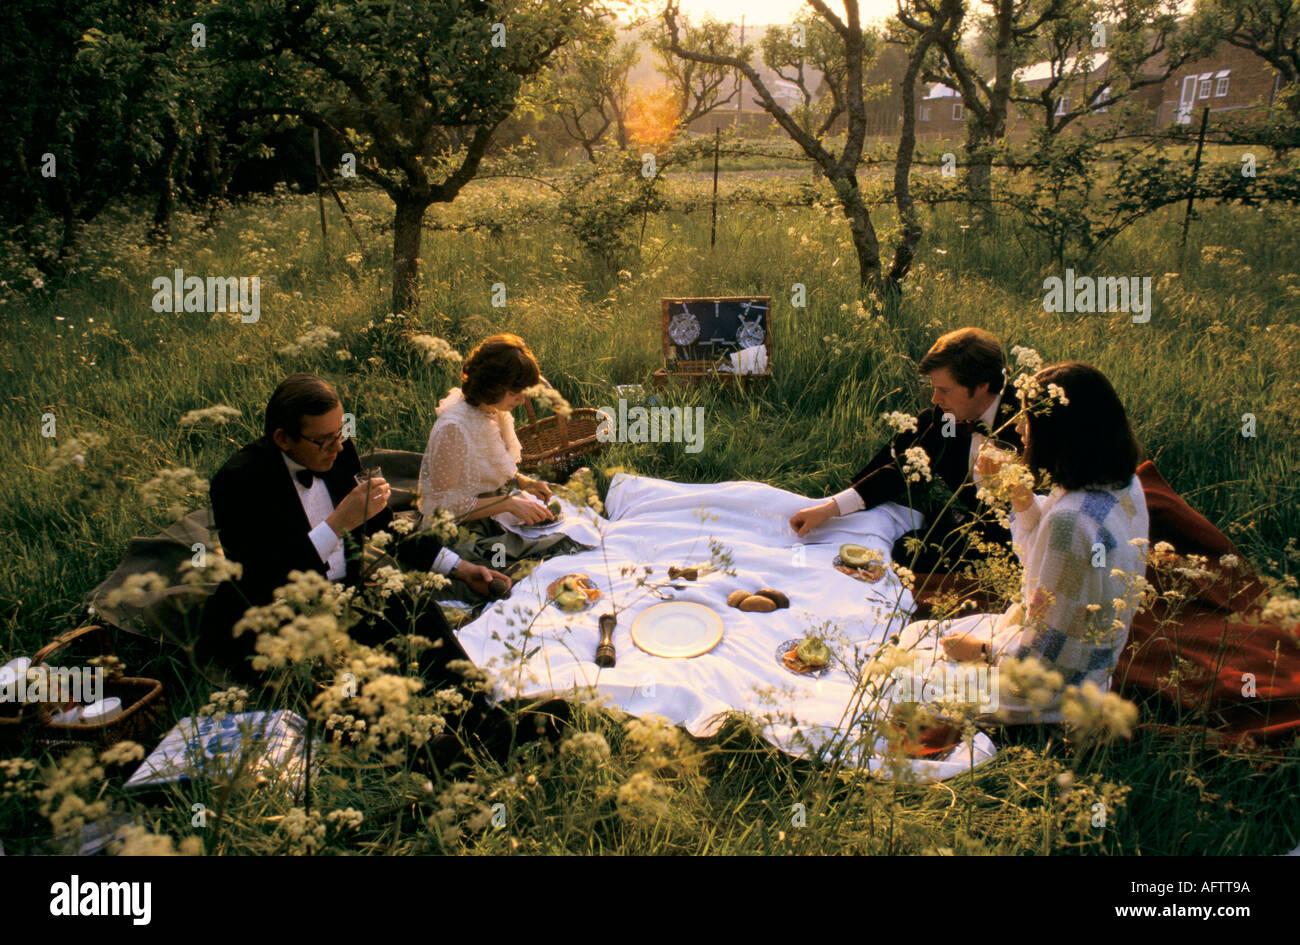 GLYNDEBOURNE FESTIVAL OPERA EAST SUSSEX PICNIC DURING INTERVAL gardens, garden  HOMER SYKES - Stock Image